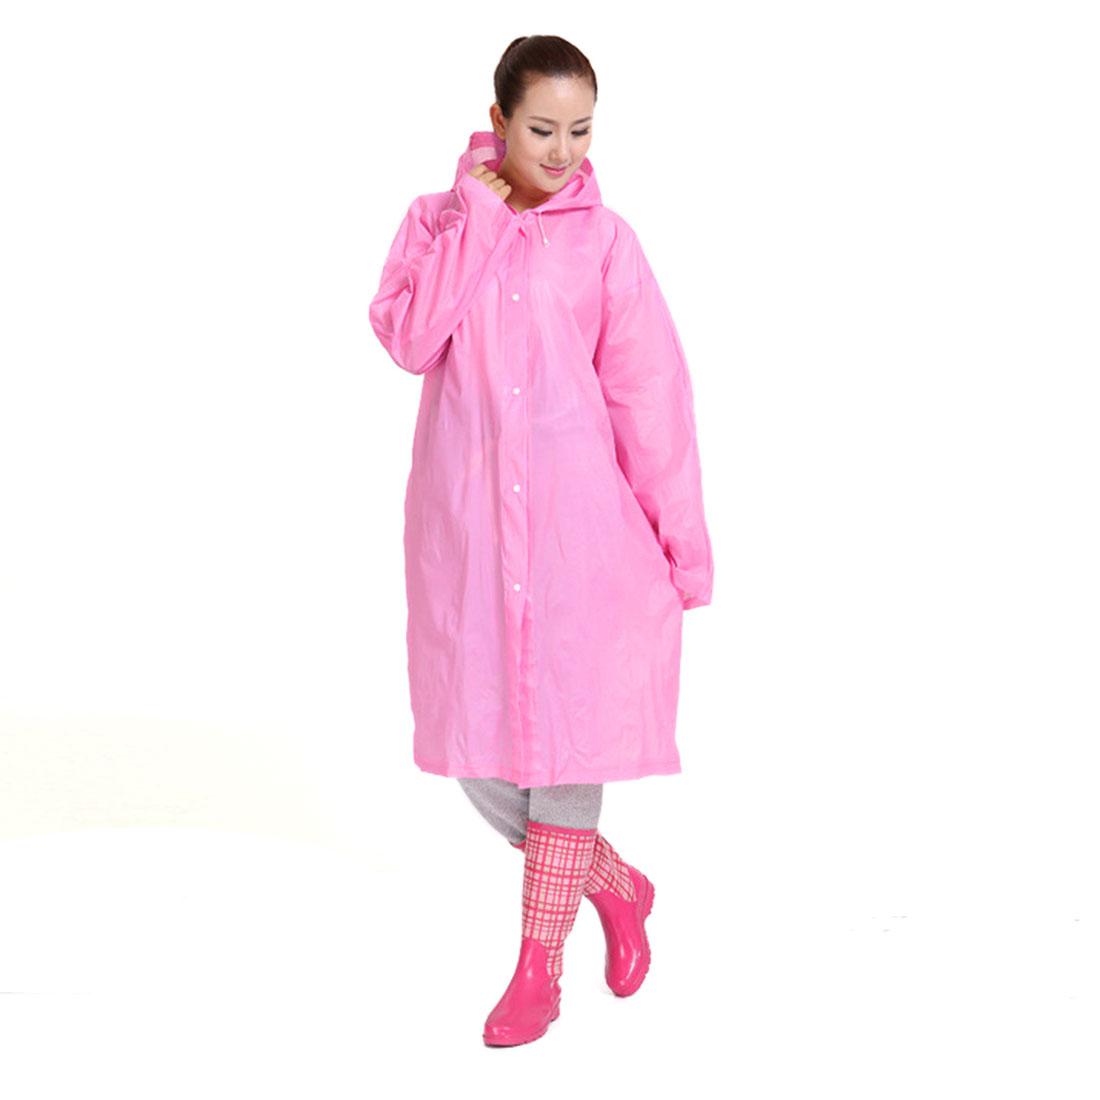 Pink EVA Outdoor Waterproof Raincoat Rainwear Hooded Rain Poncho for Bicycle